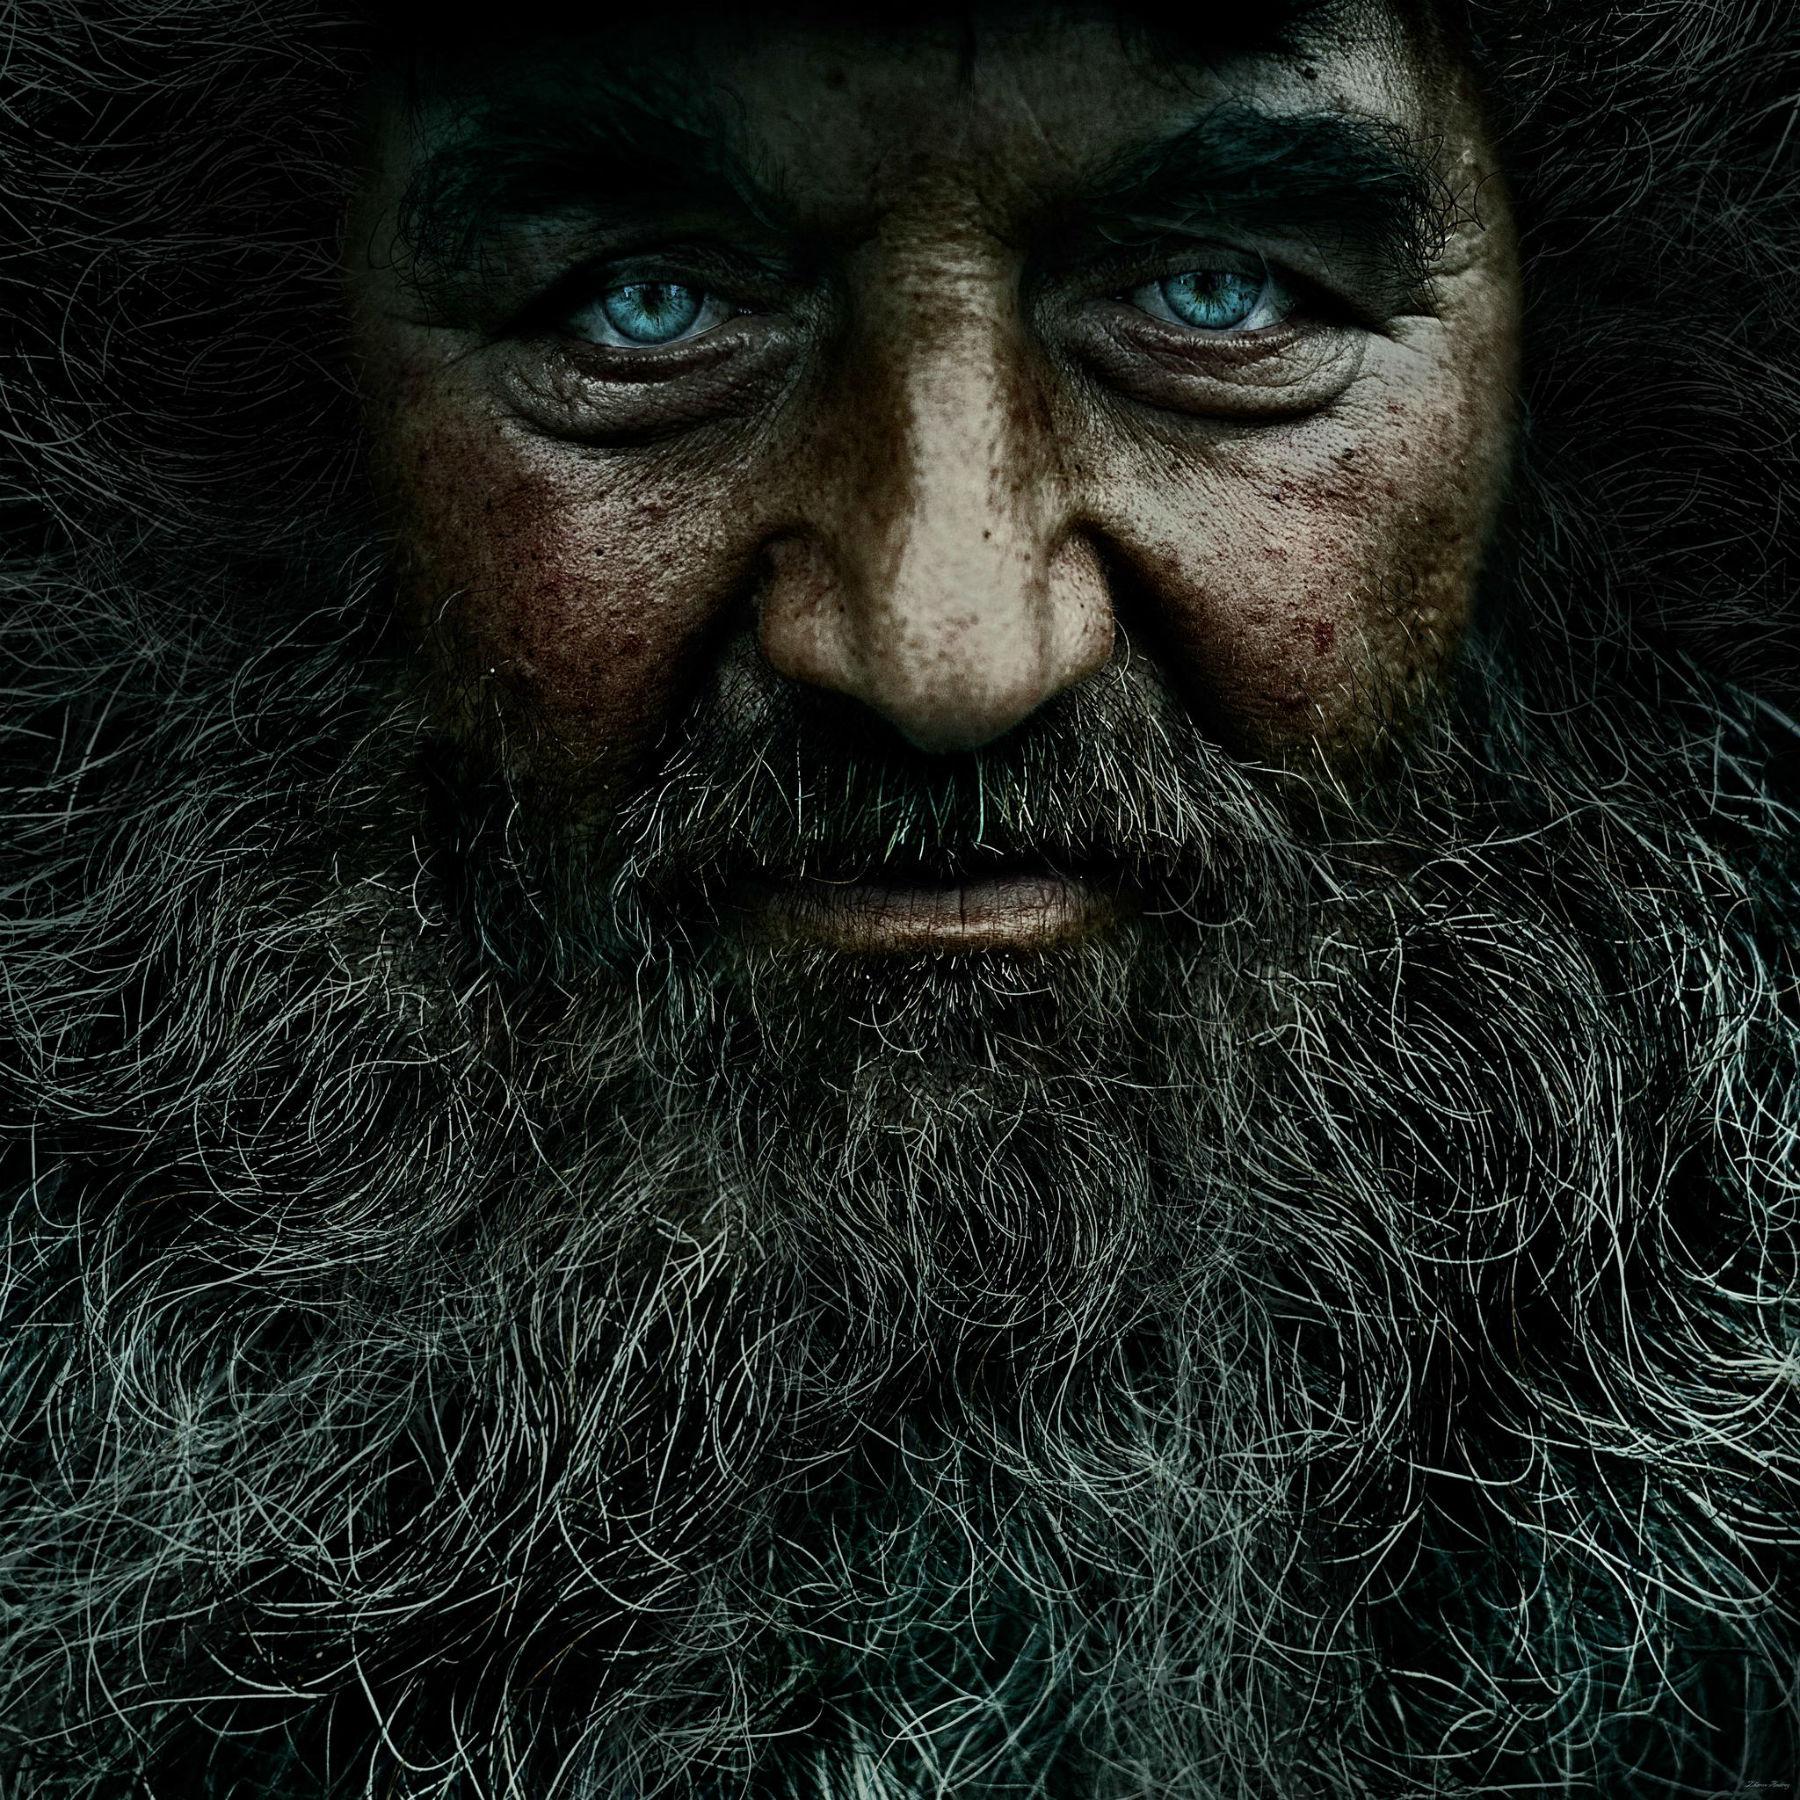 Andrey Zharov bearded photo realist photography portrait